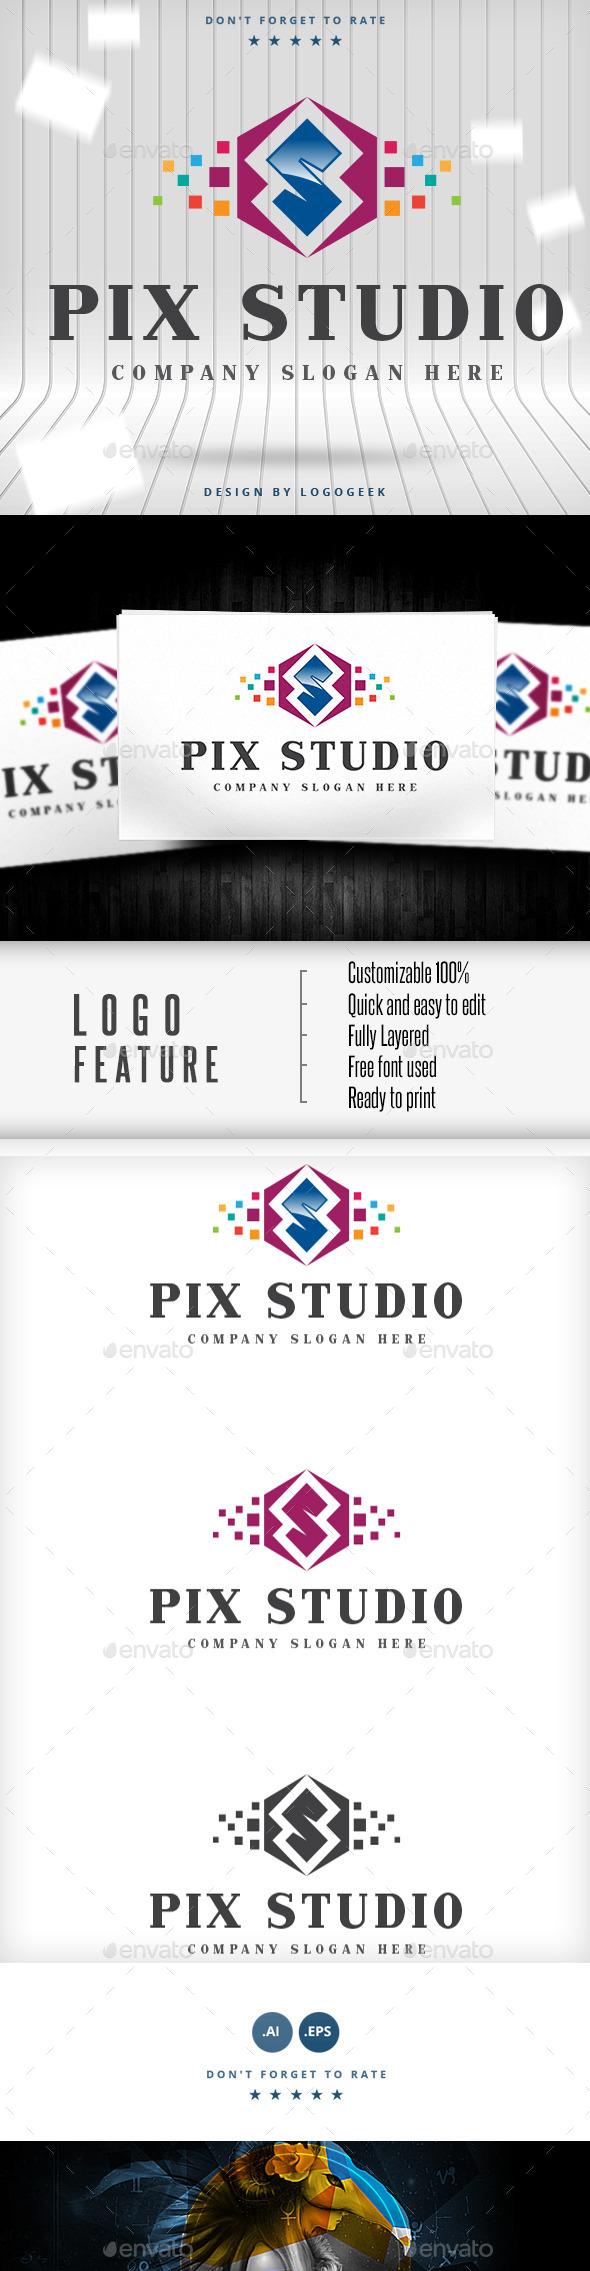 Pix Studio Logo